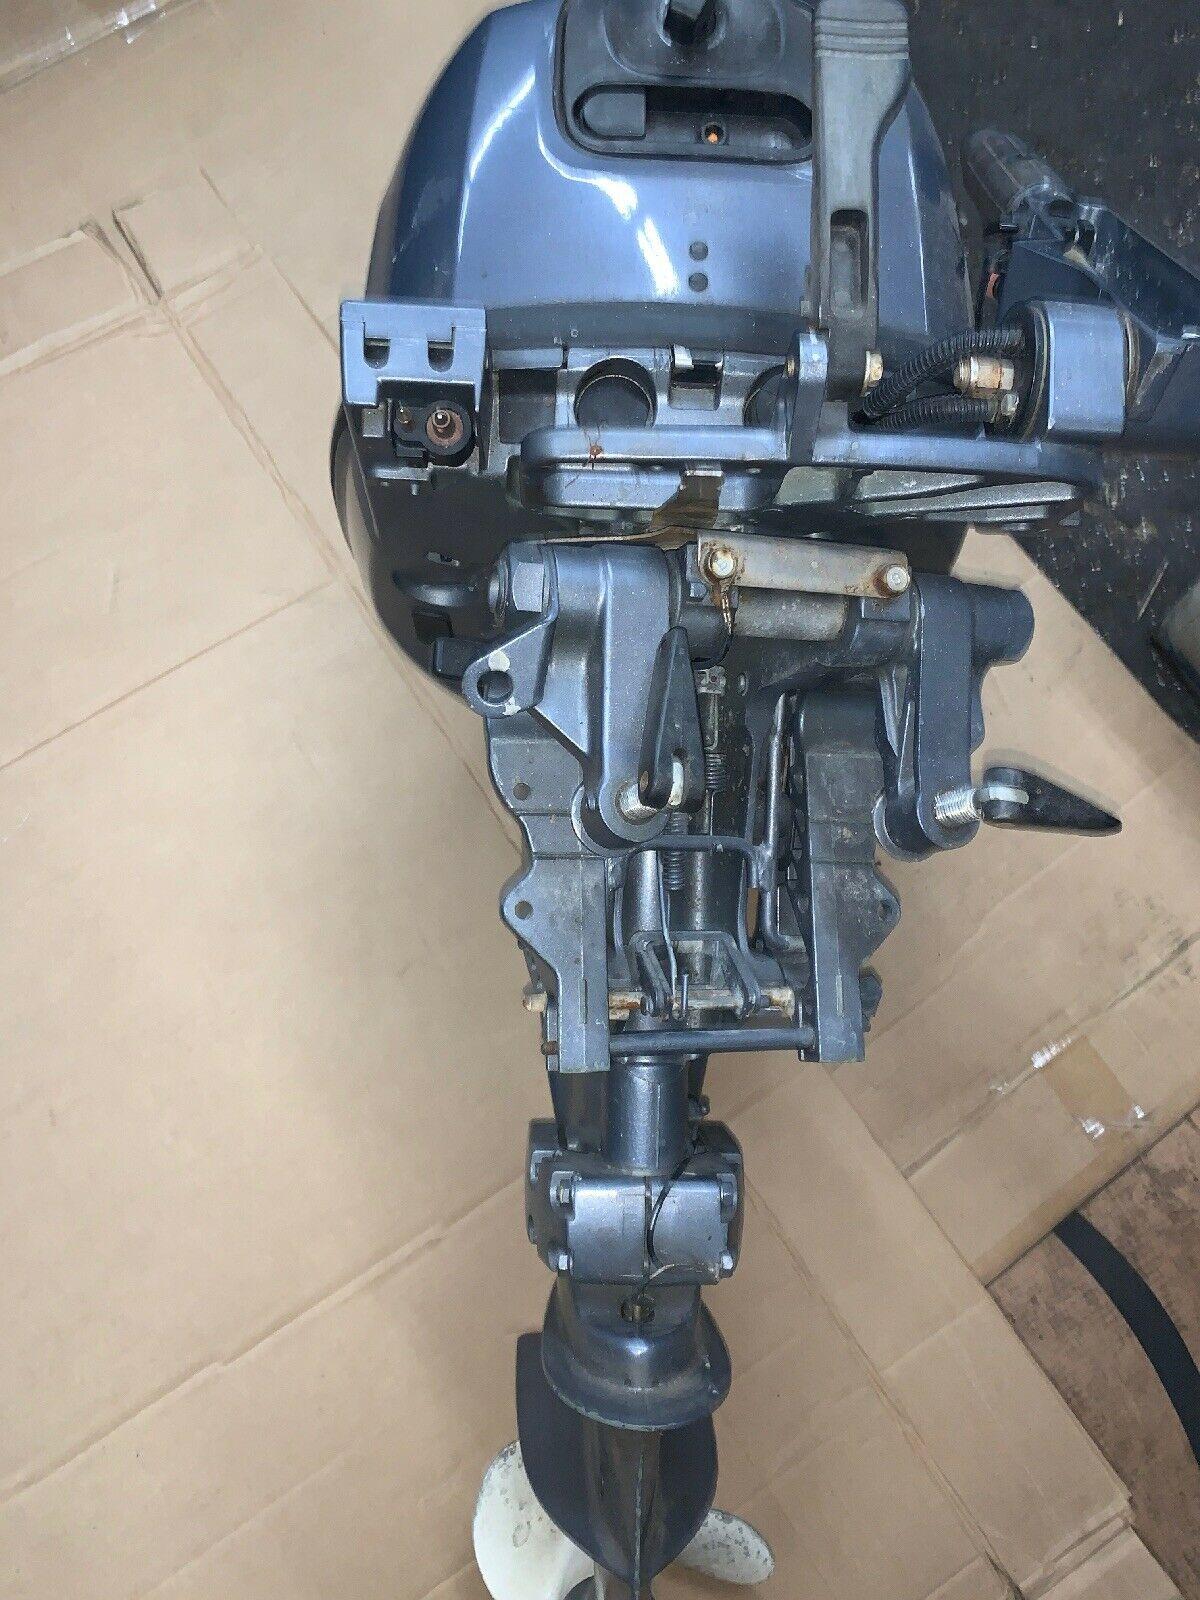 "2000 Yamaha 4 Stroke 15 HP Εξωλέμβιος Ναυτικός Κινητήρας 15 ""άξονας"